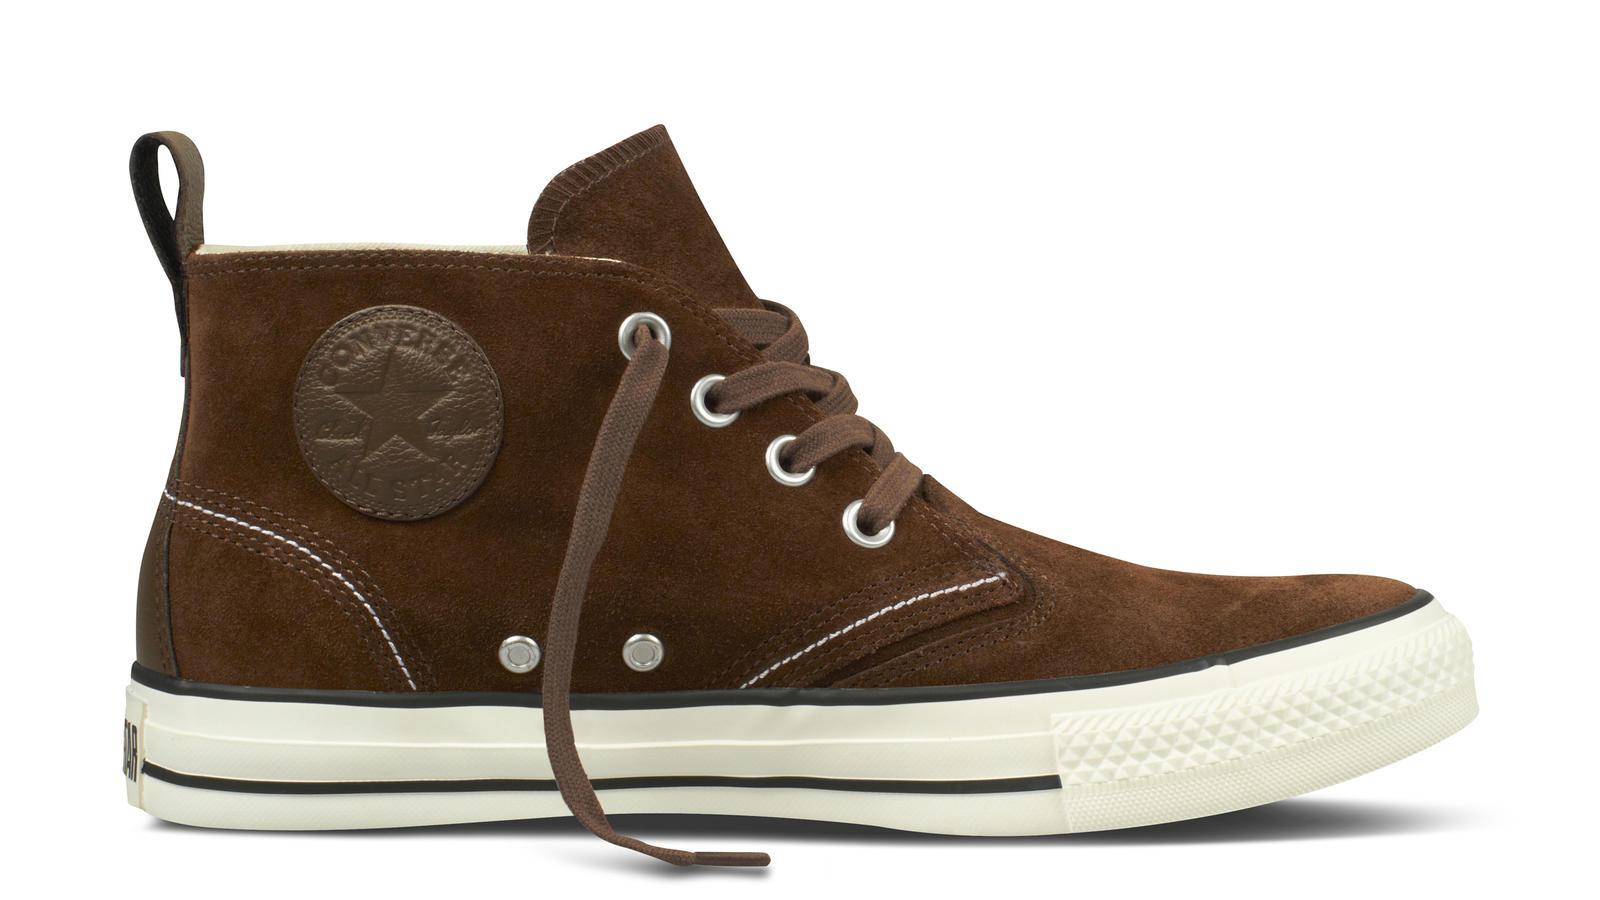 2f7fa9766f87 Converse Announces Fall 2012 Chuck Taylor All Star Footwear ...